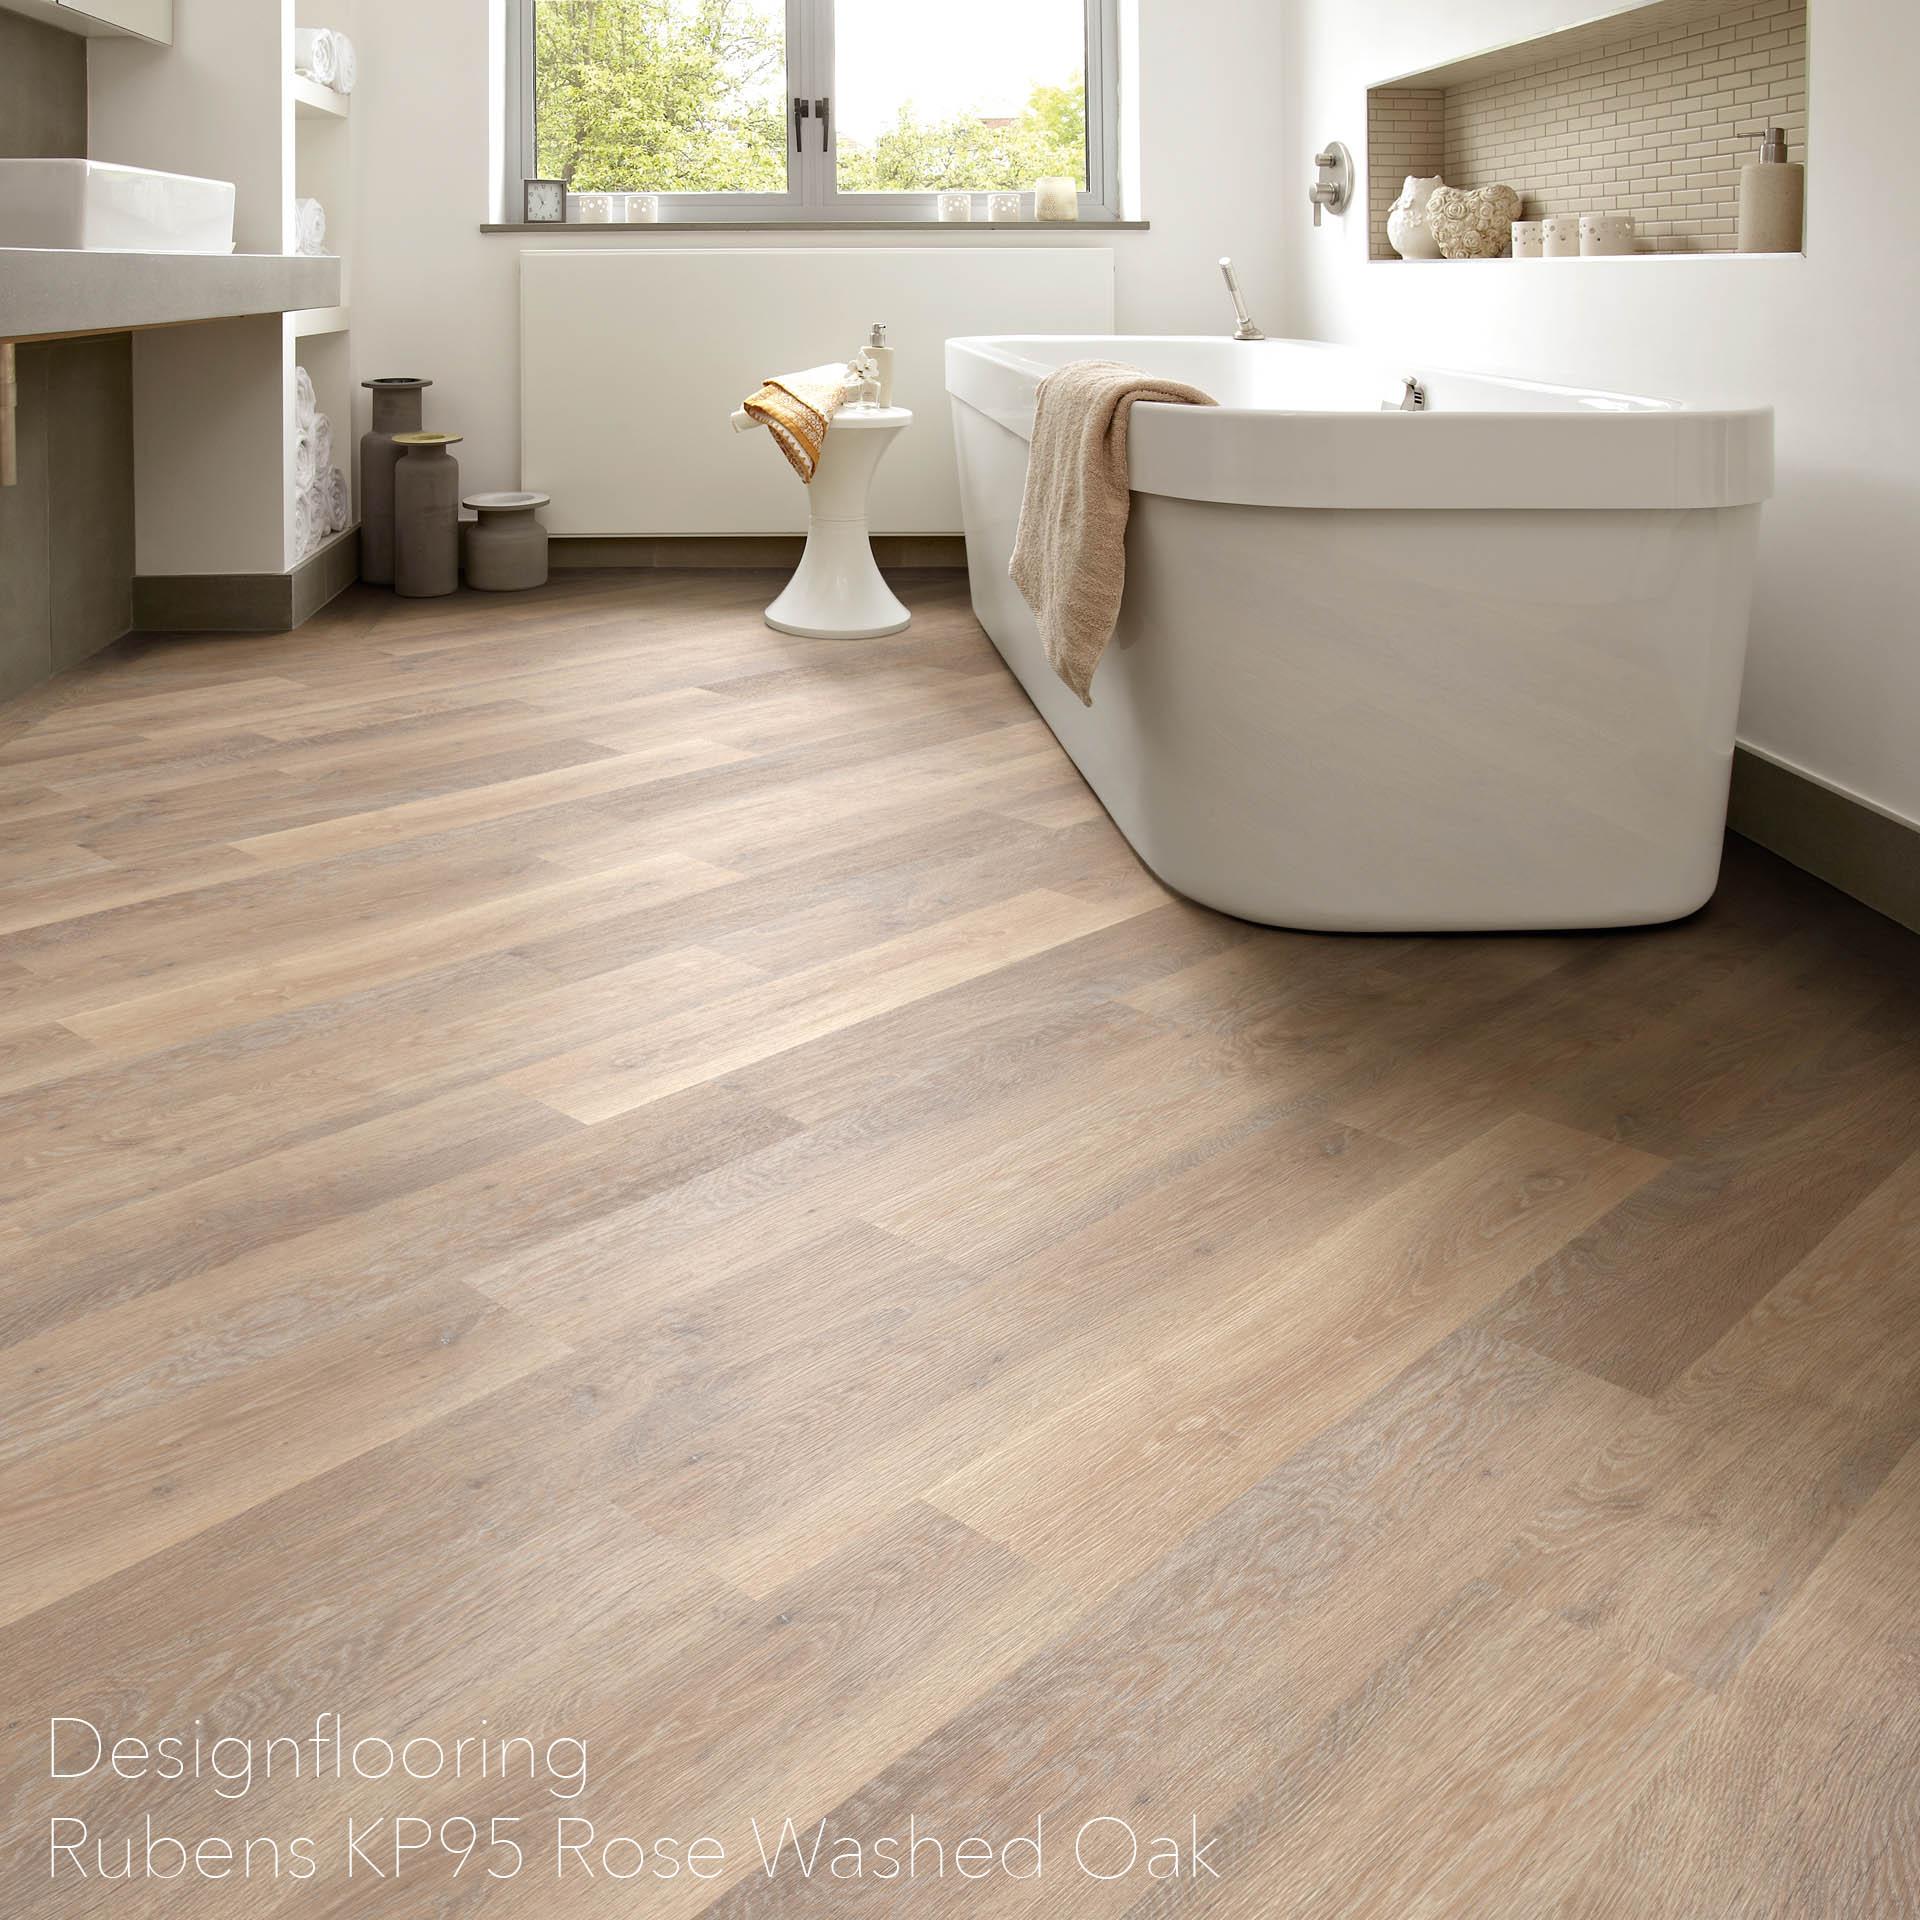 Podłogi Do łazienki Panele Winylowe Designflooringrubens